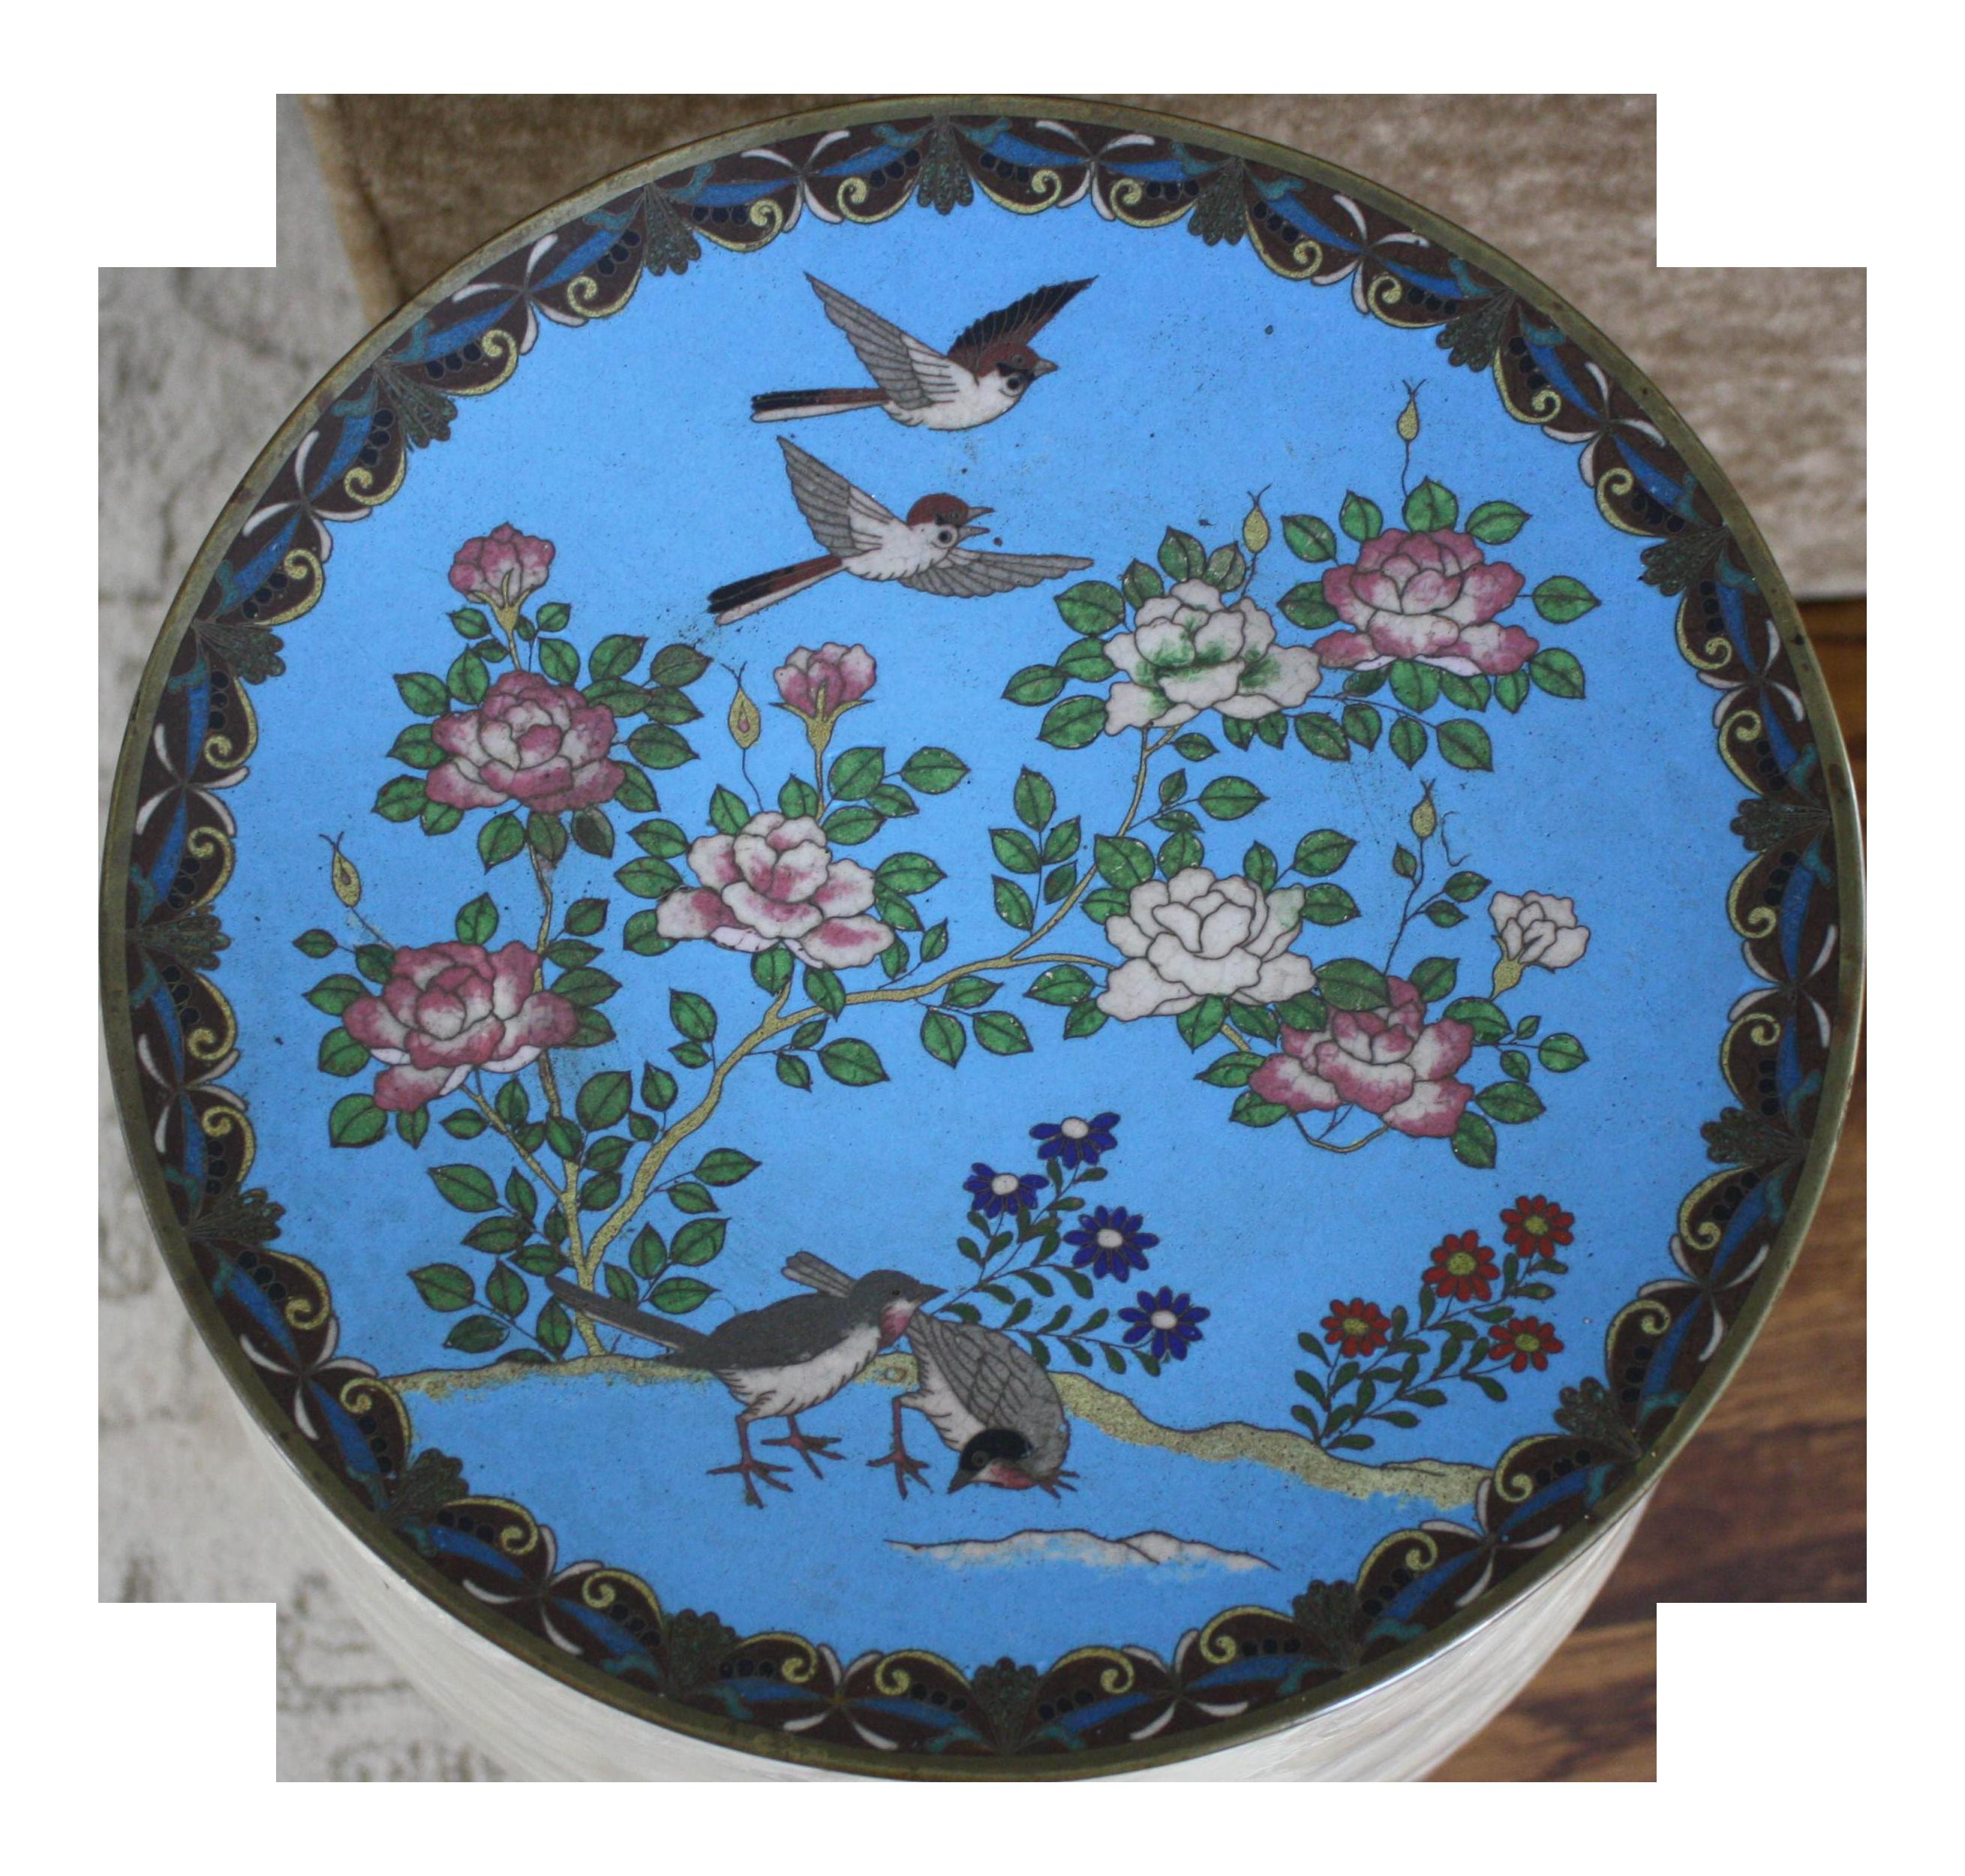 Antique Japanese Meiji Period Cloisonné Charger Plate  sc 1 st  Chairish & Vintage \u0026 Used Japanese Decorative Plates   Chairish